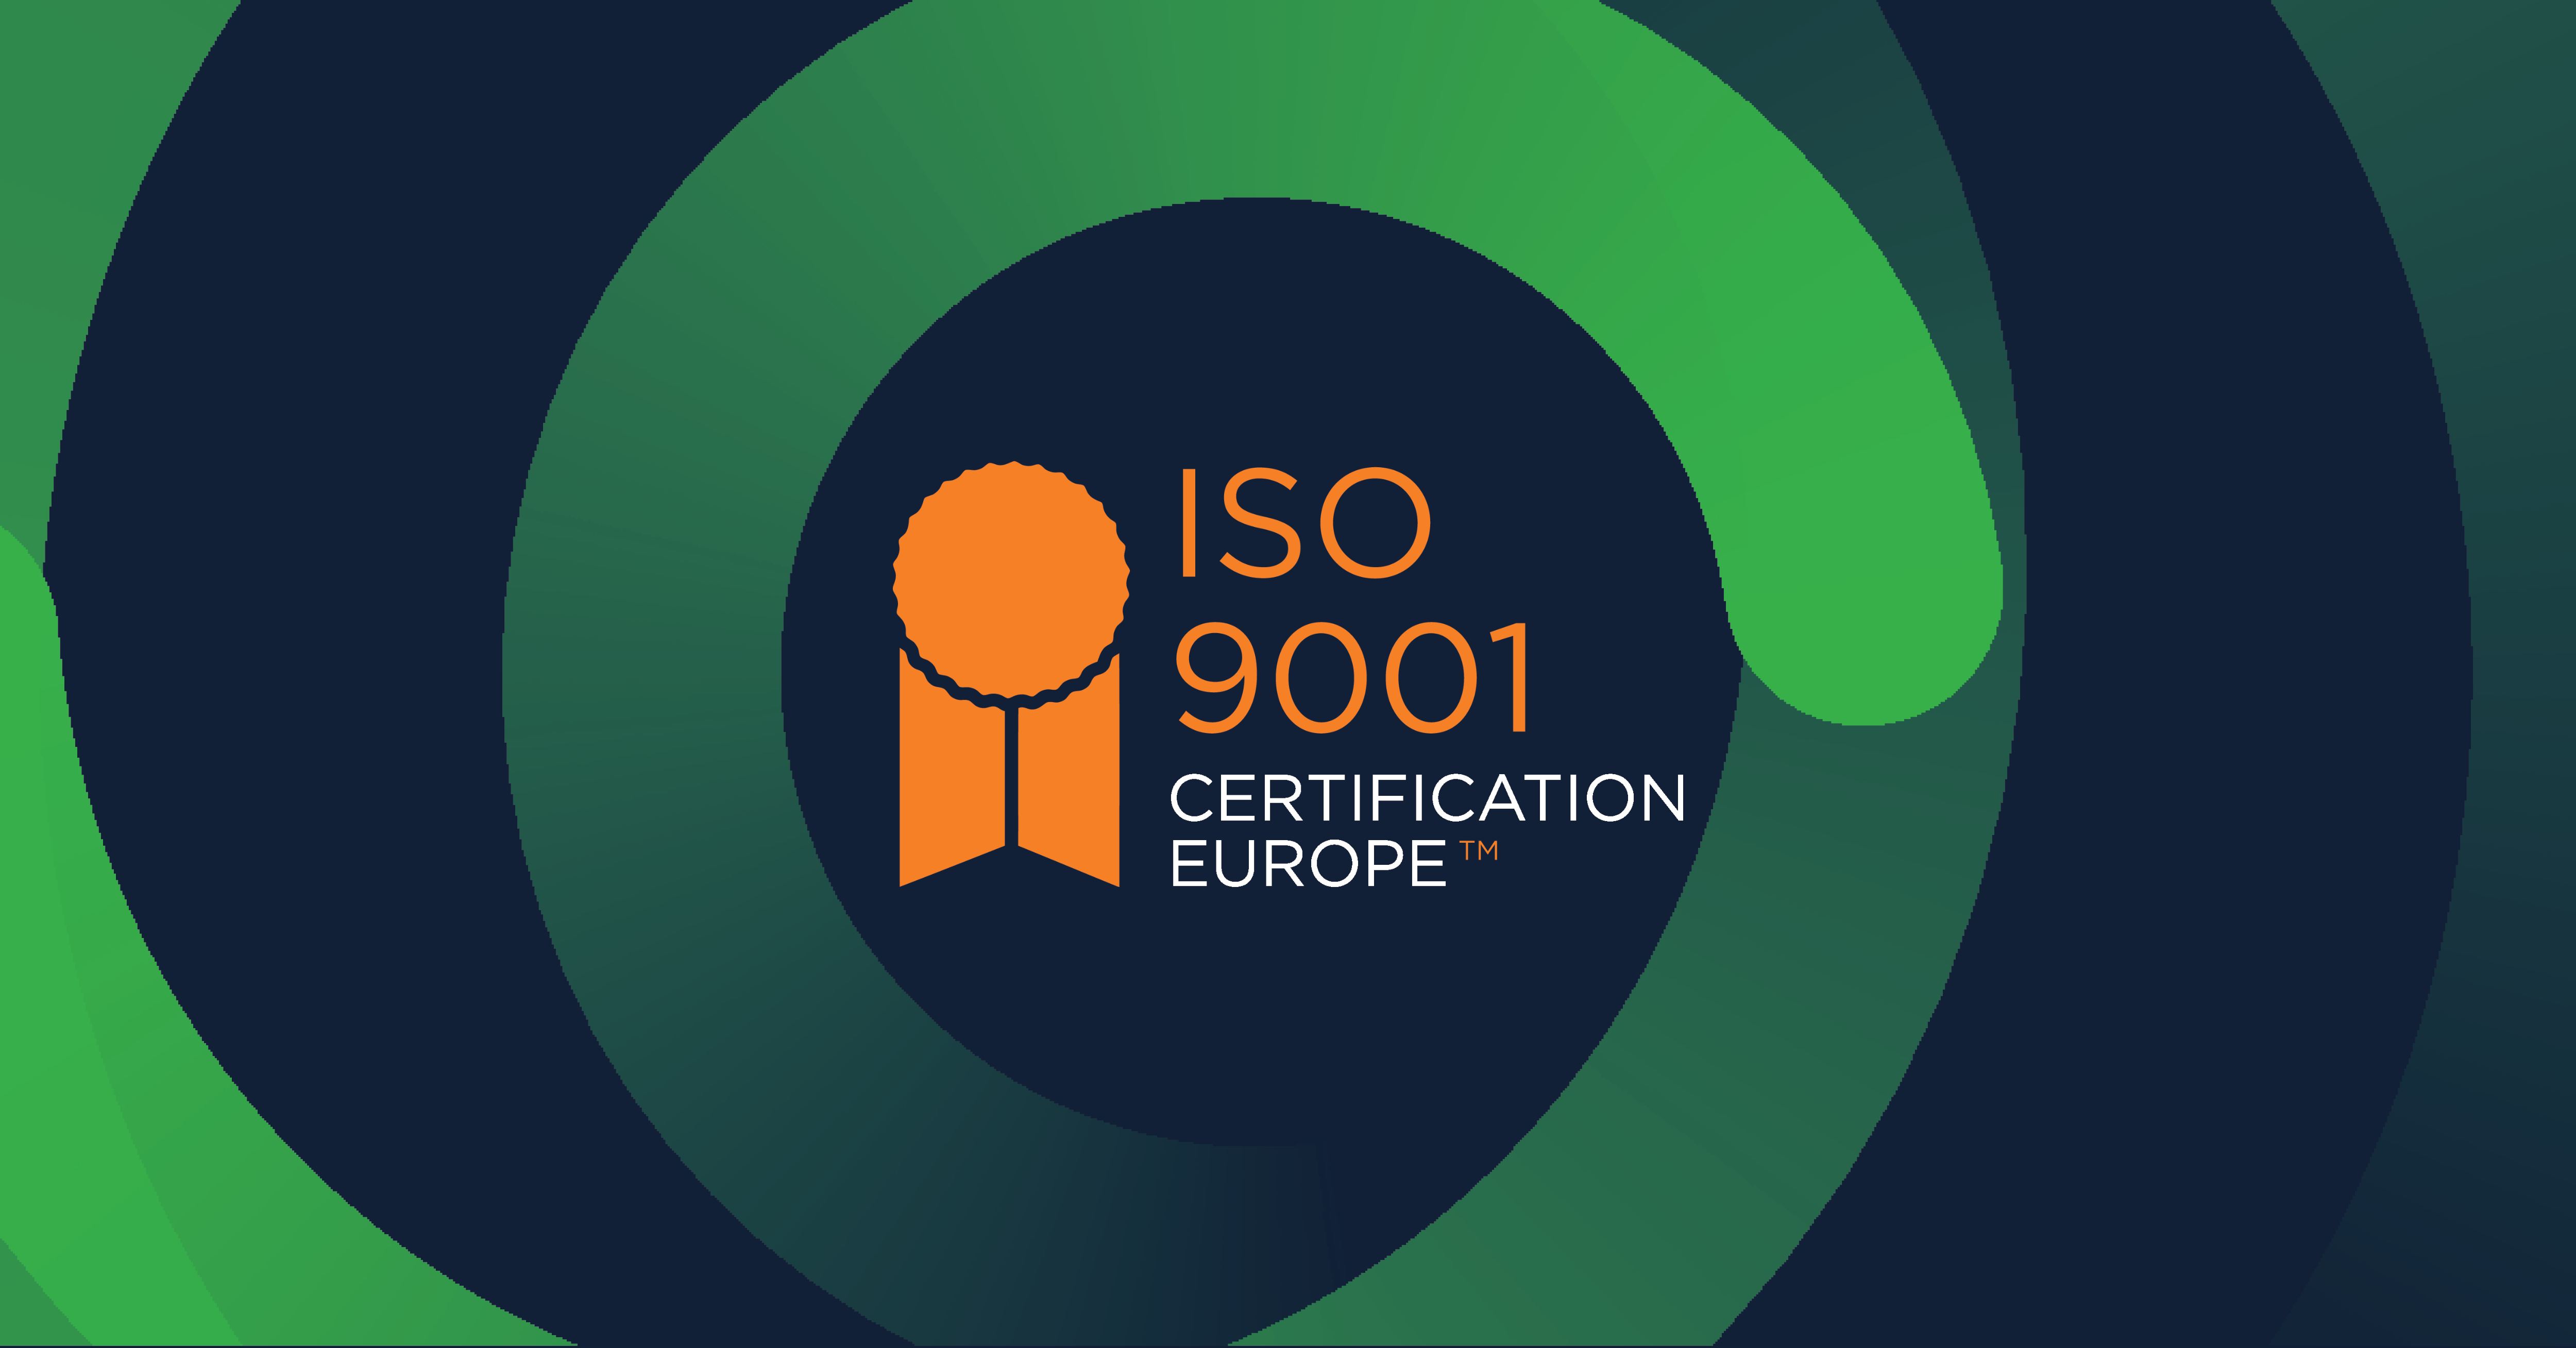 TDS-x-ISO9001-FI